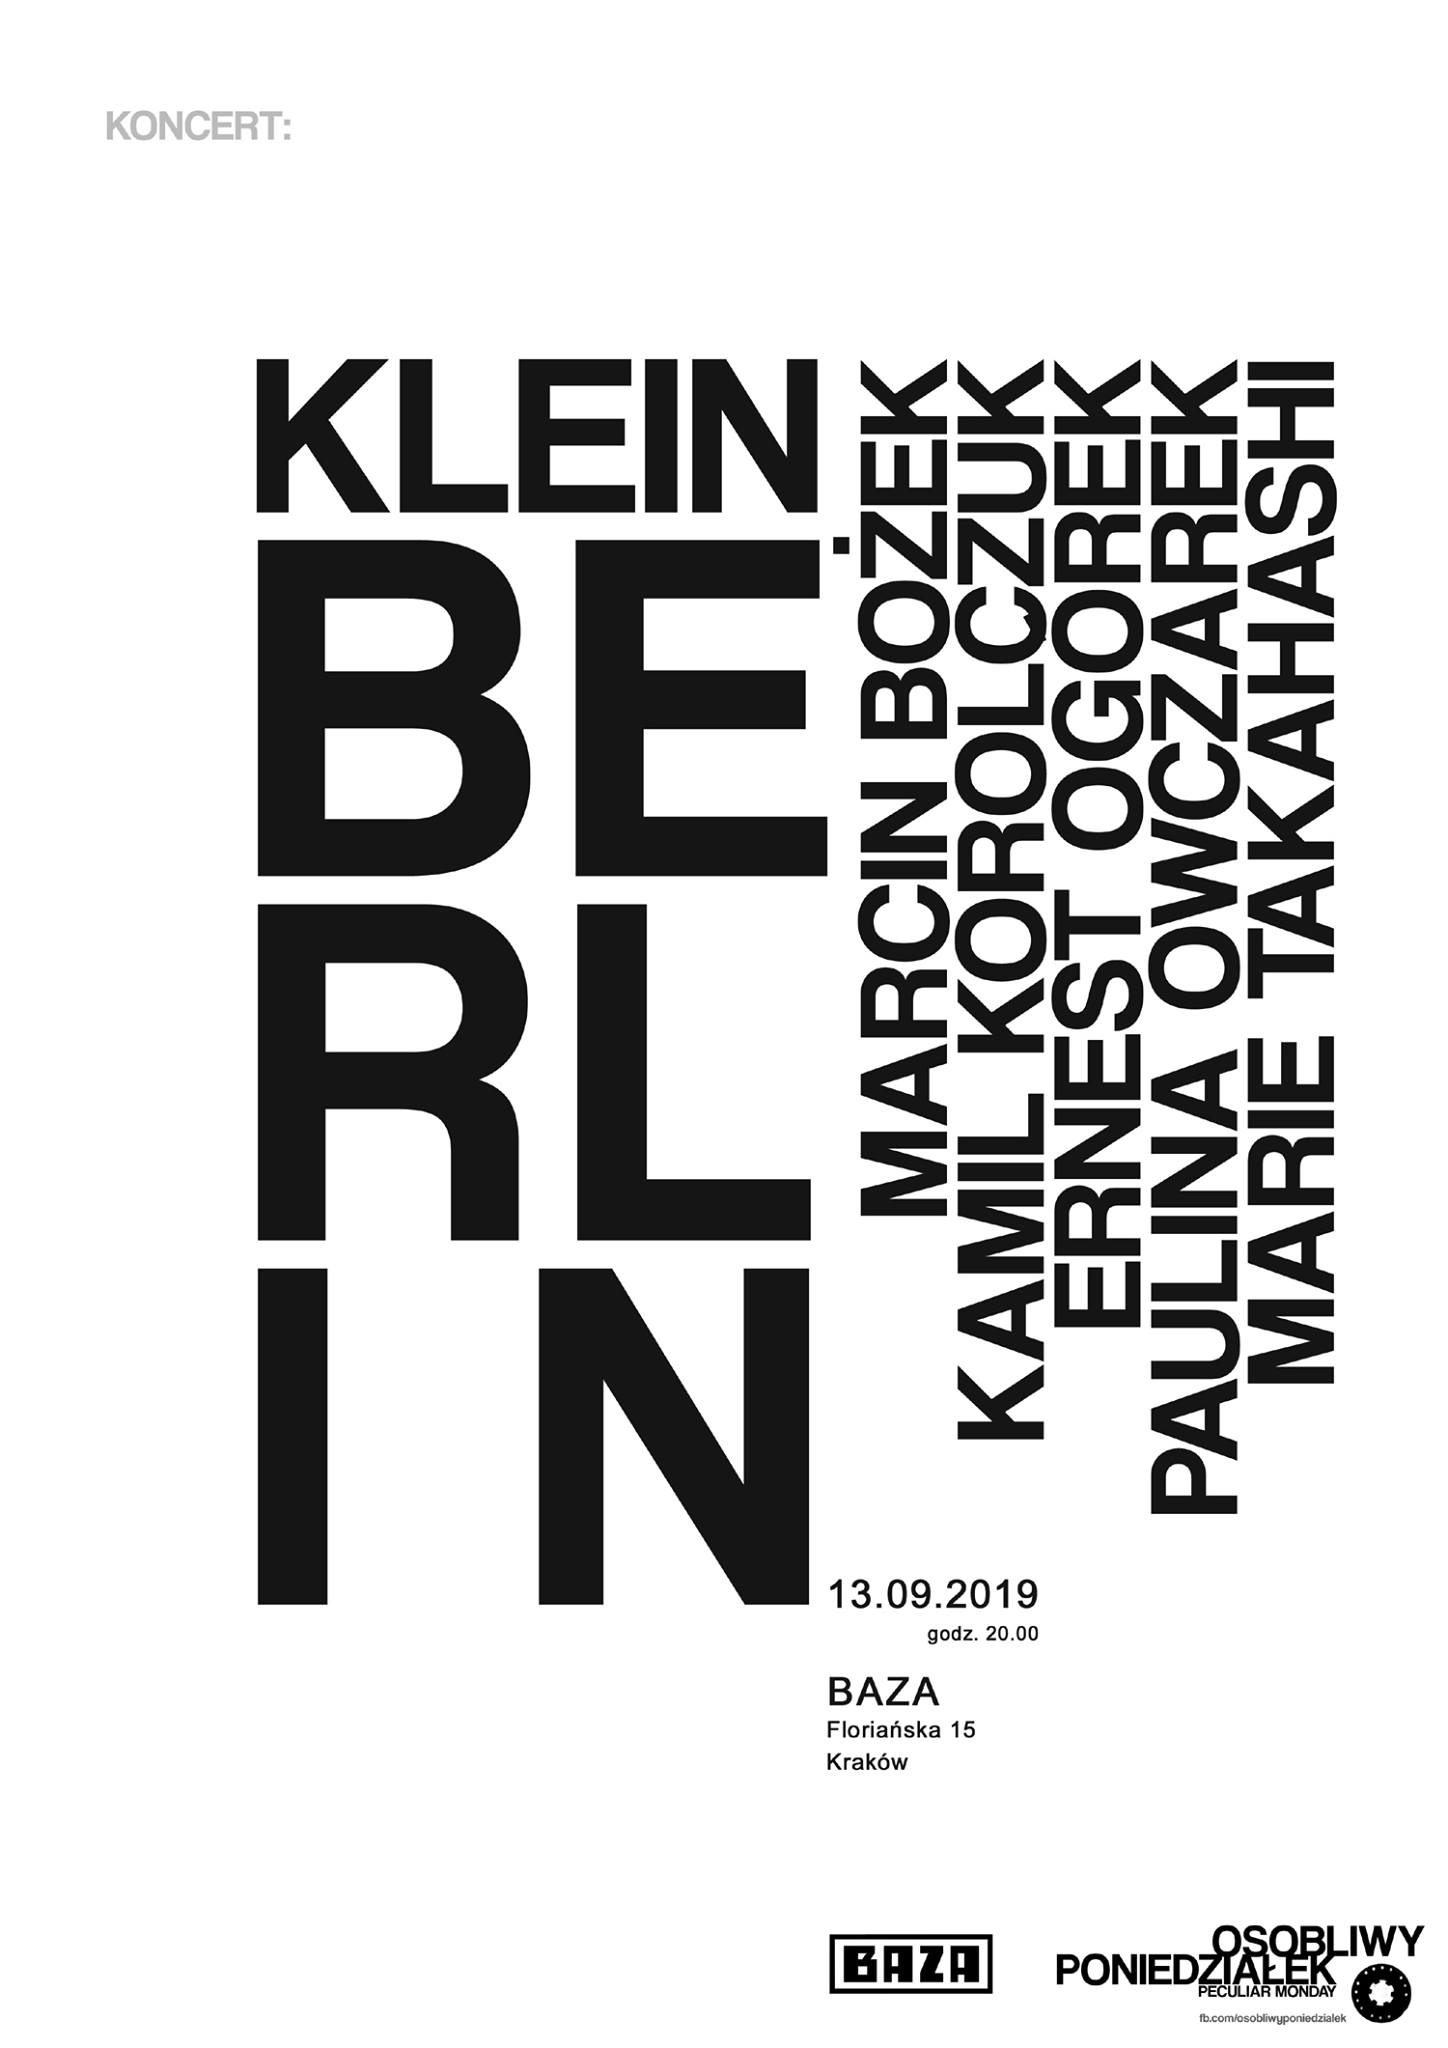 KLEIN BERLIN Kraków Baza 13.09.2019 20:00